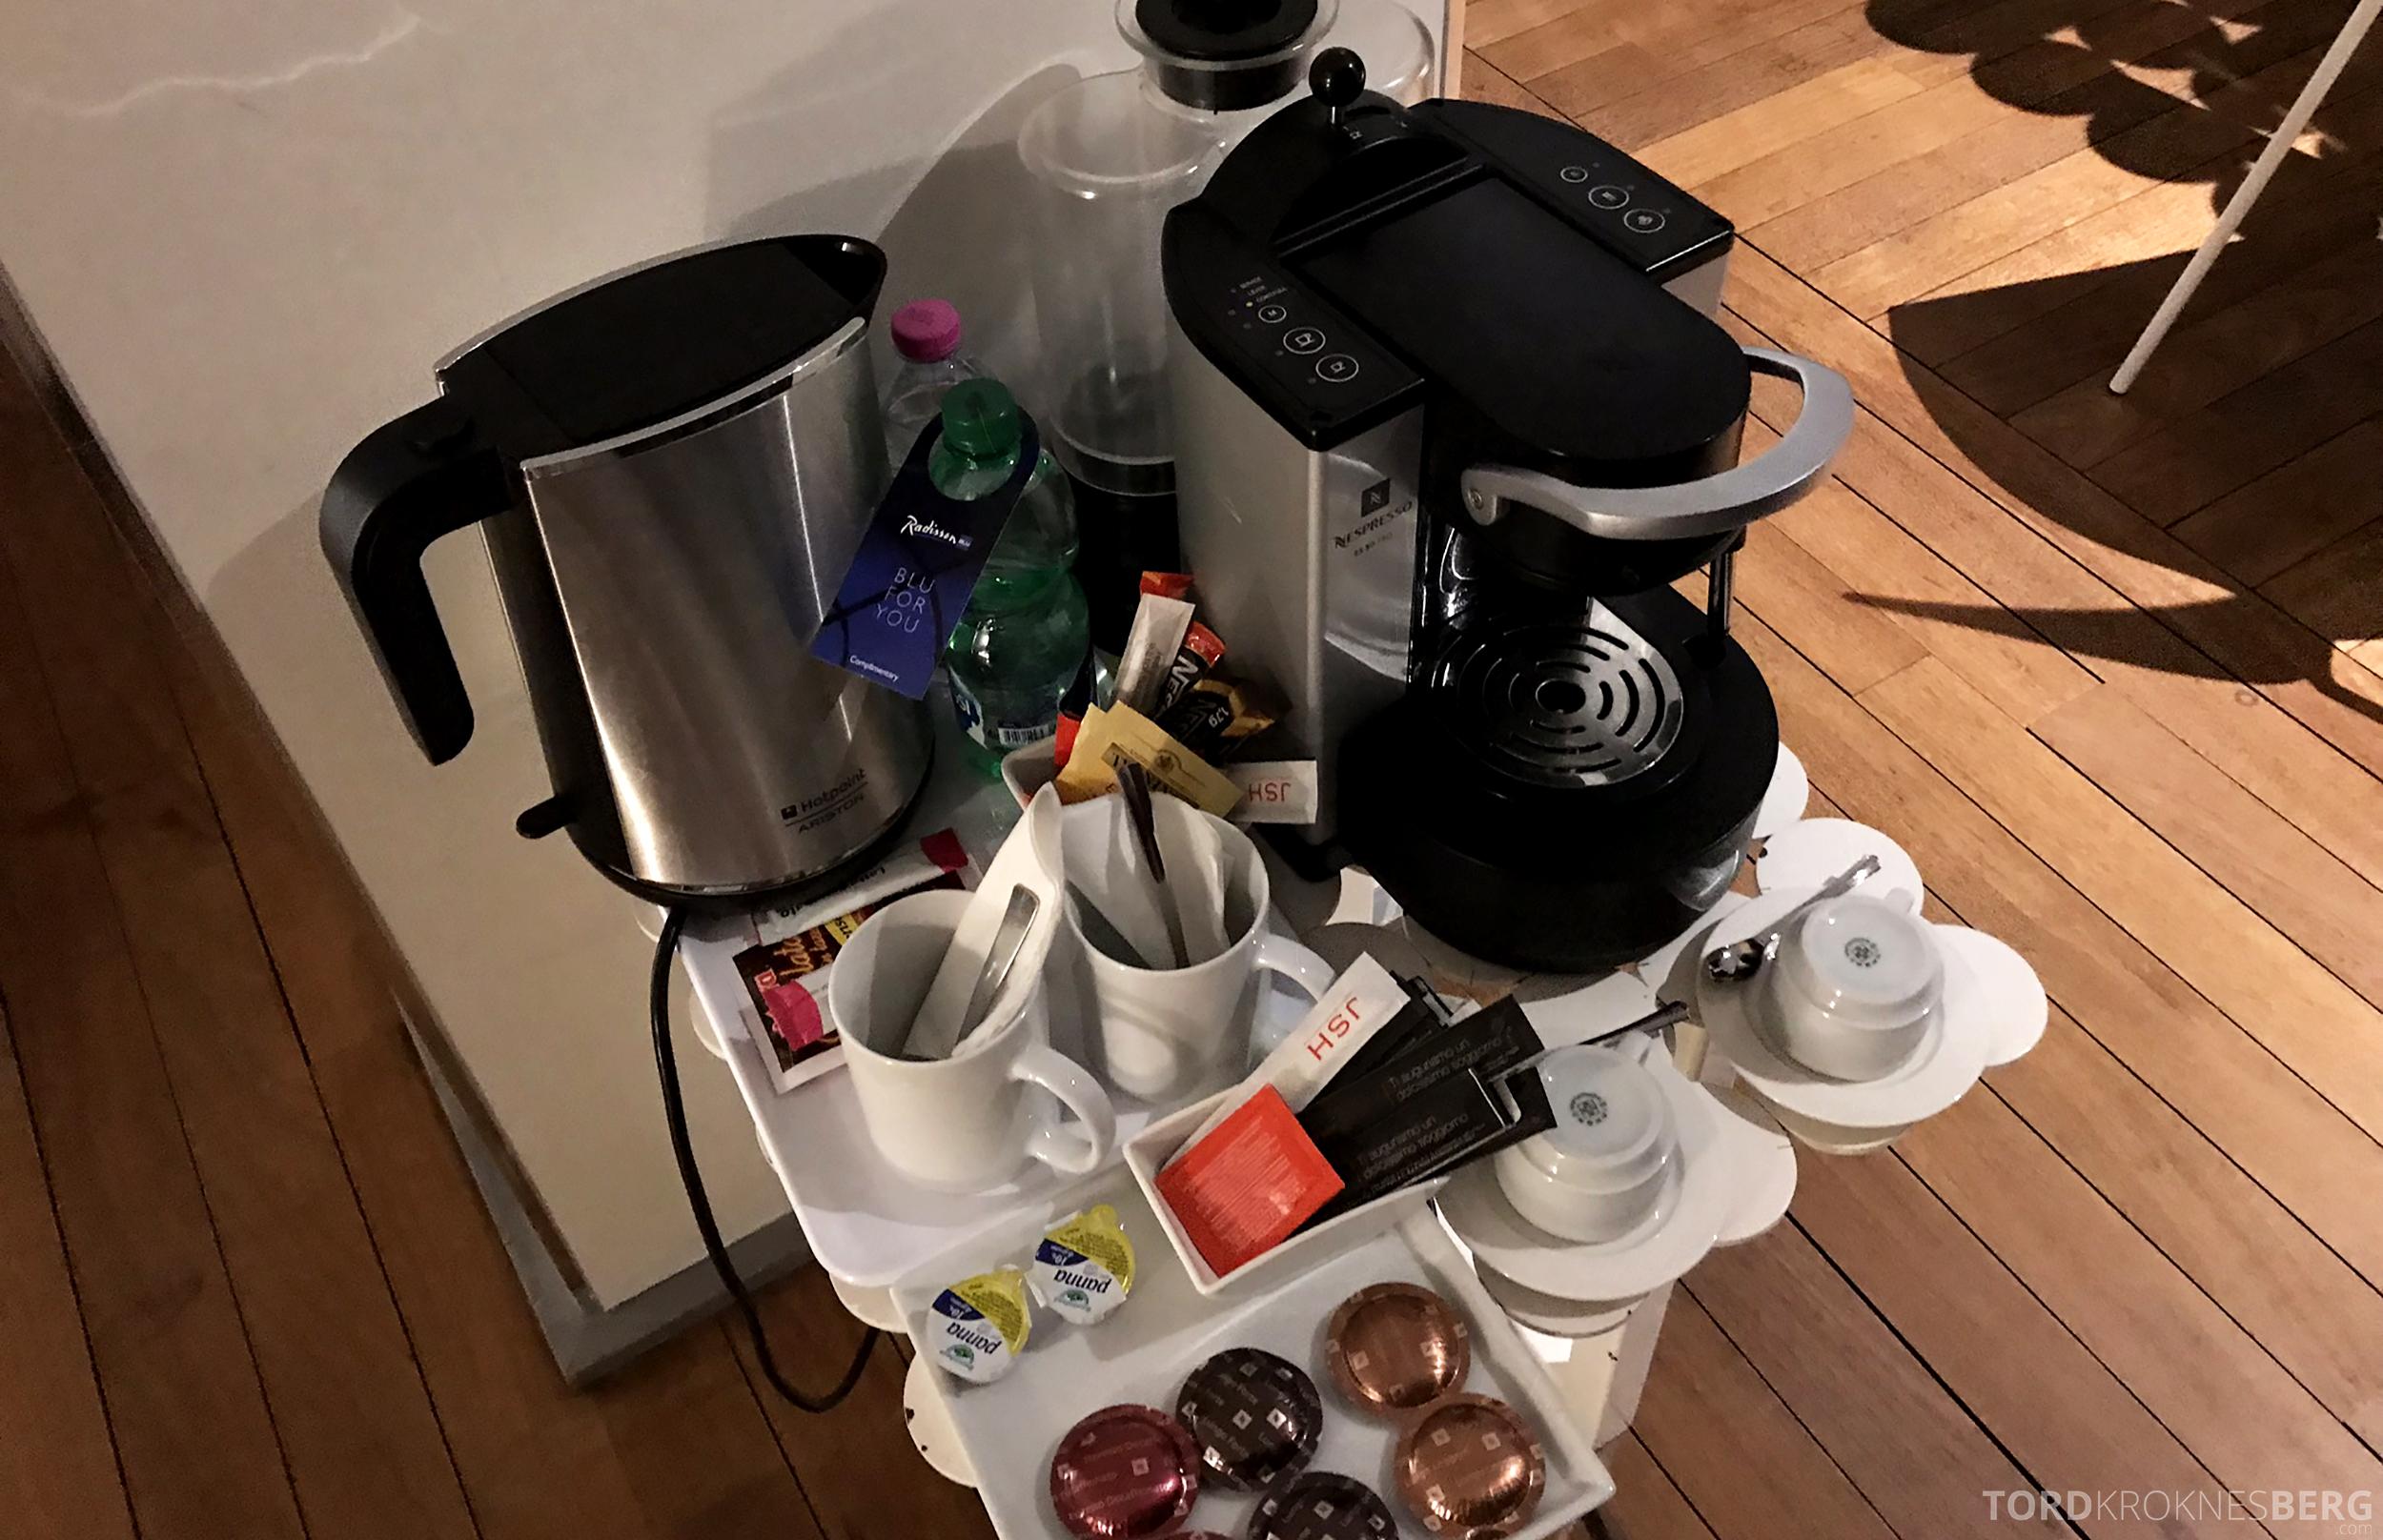 Radisson Blu Rome Hotel kaffe og te